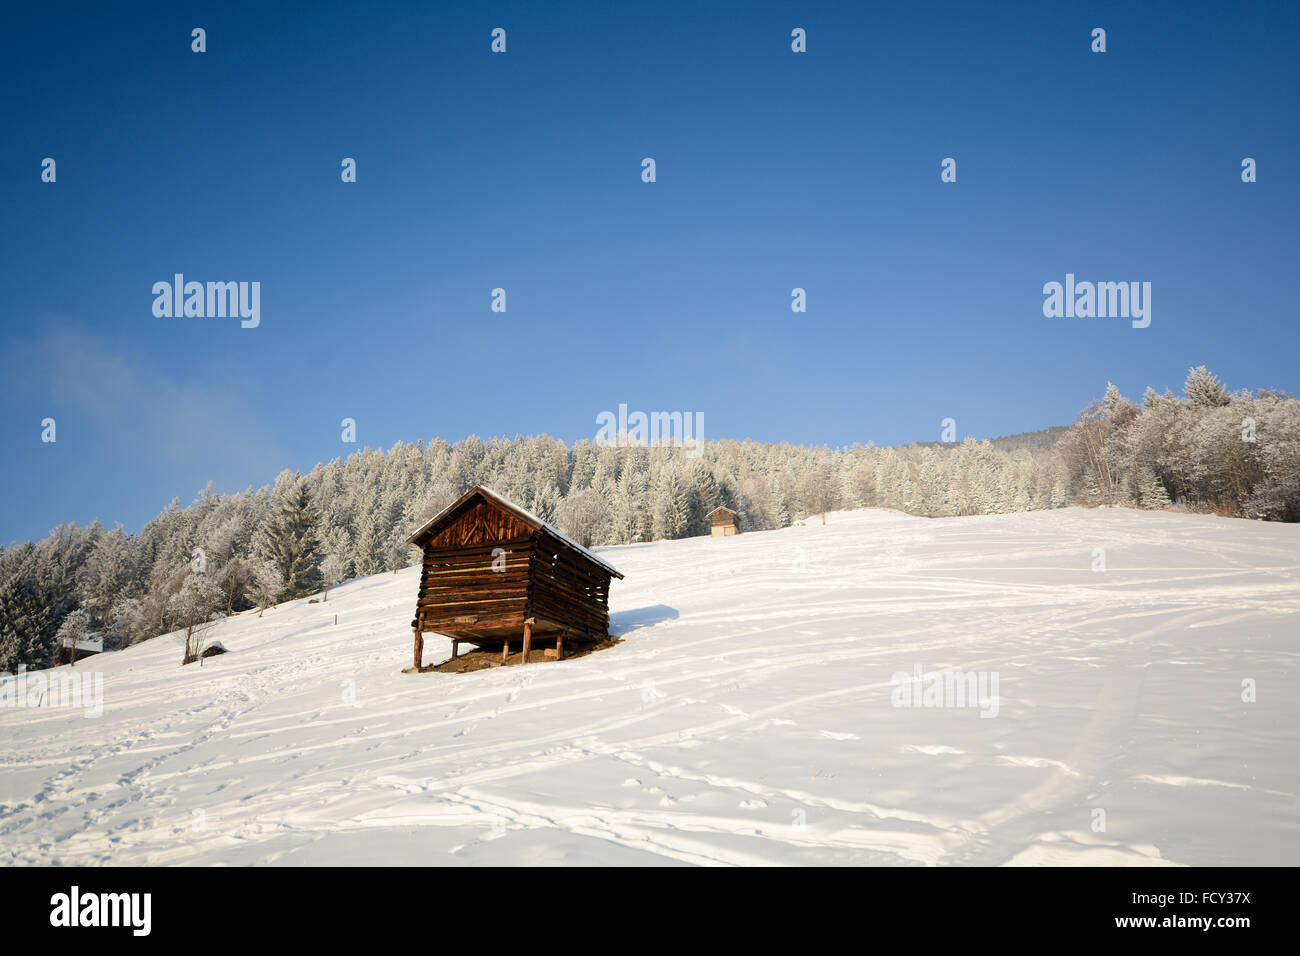 Winter landscape with wooden hut, Pitztal Alps - Tyrol Austria Stock Photo